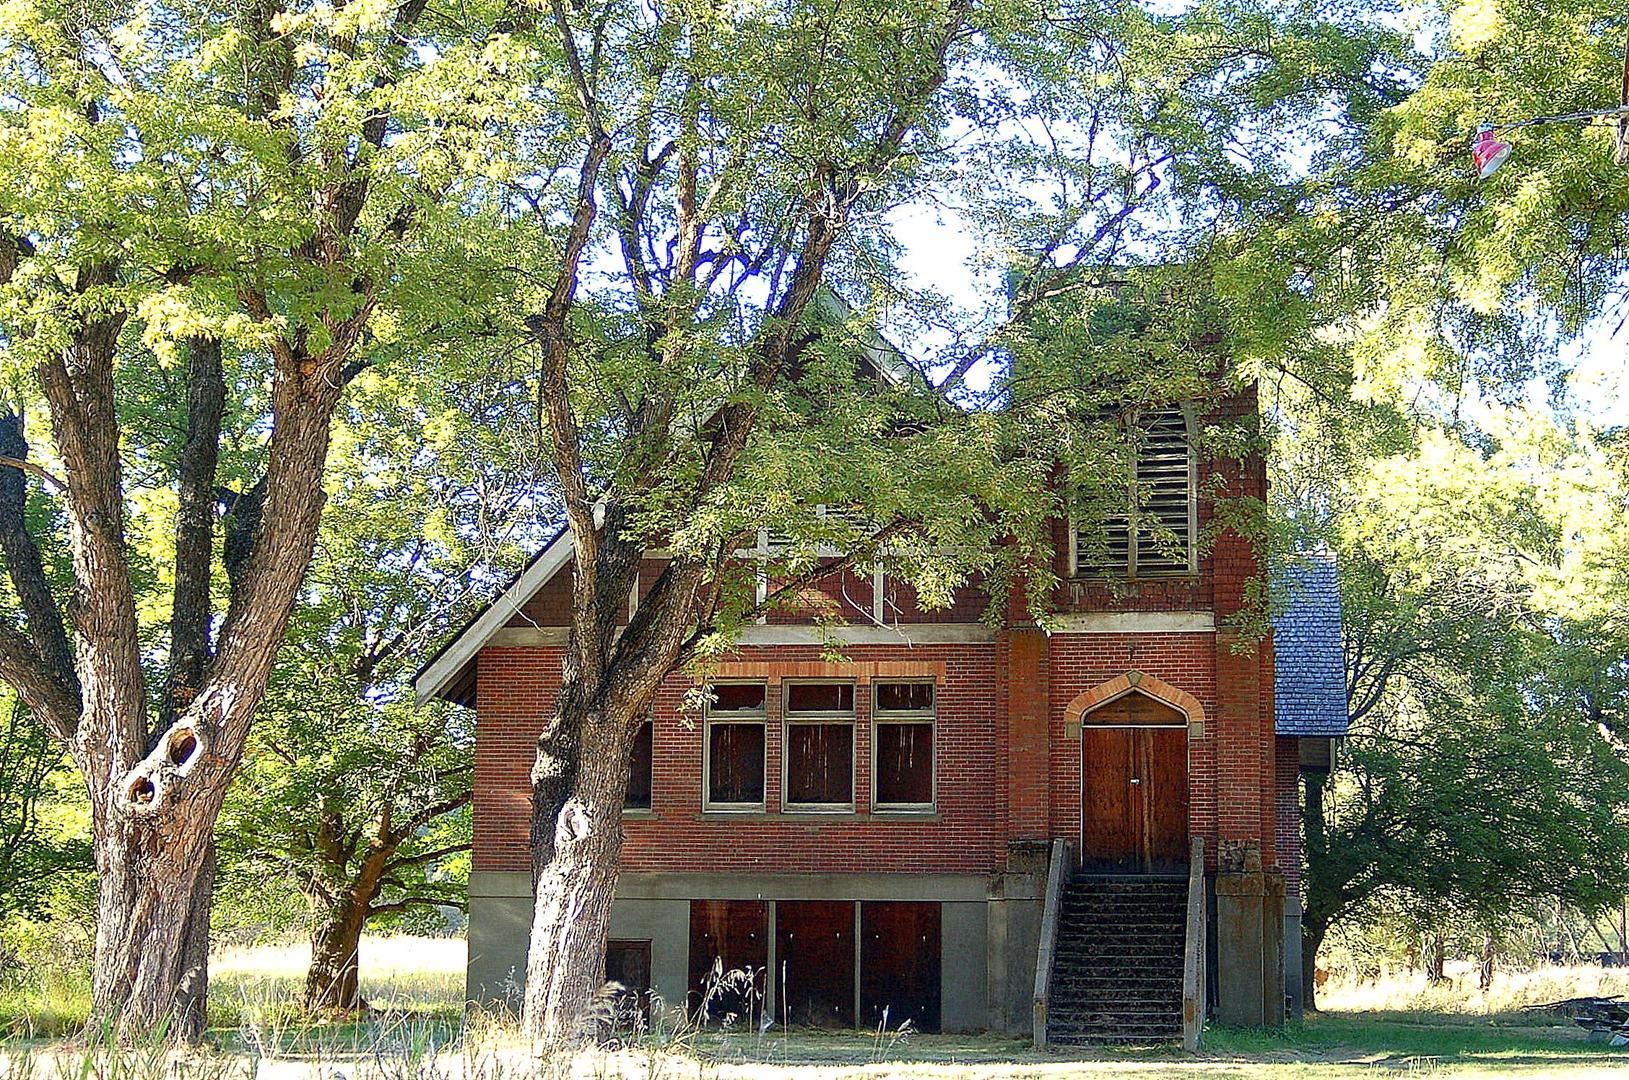 The abandoned United Brethren Church